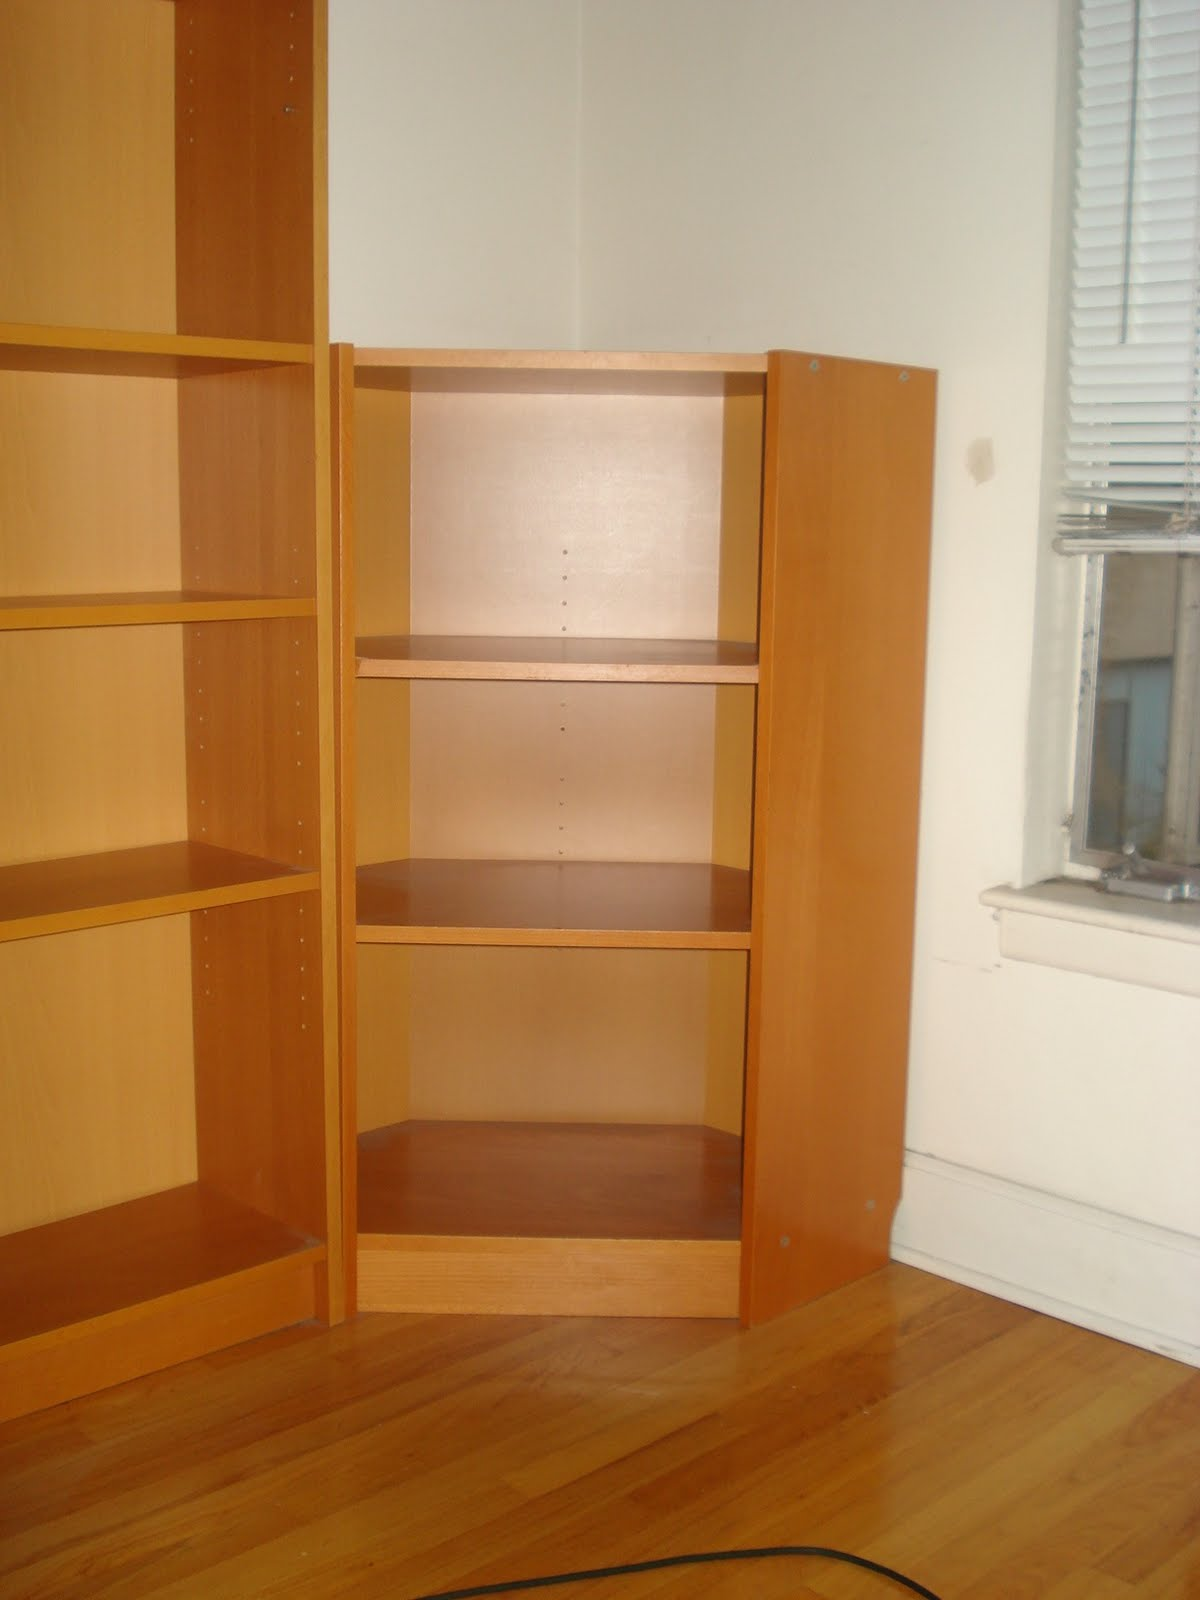 Craig S Garage Sale Ikea Corner Bookcase